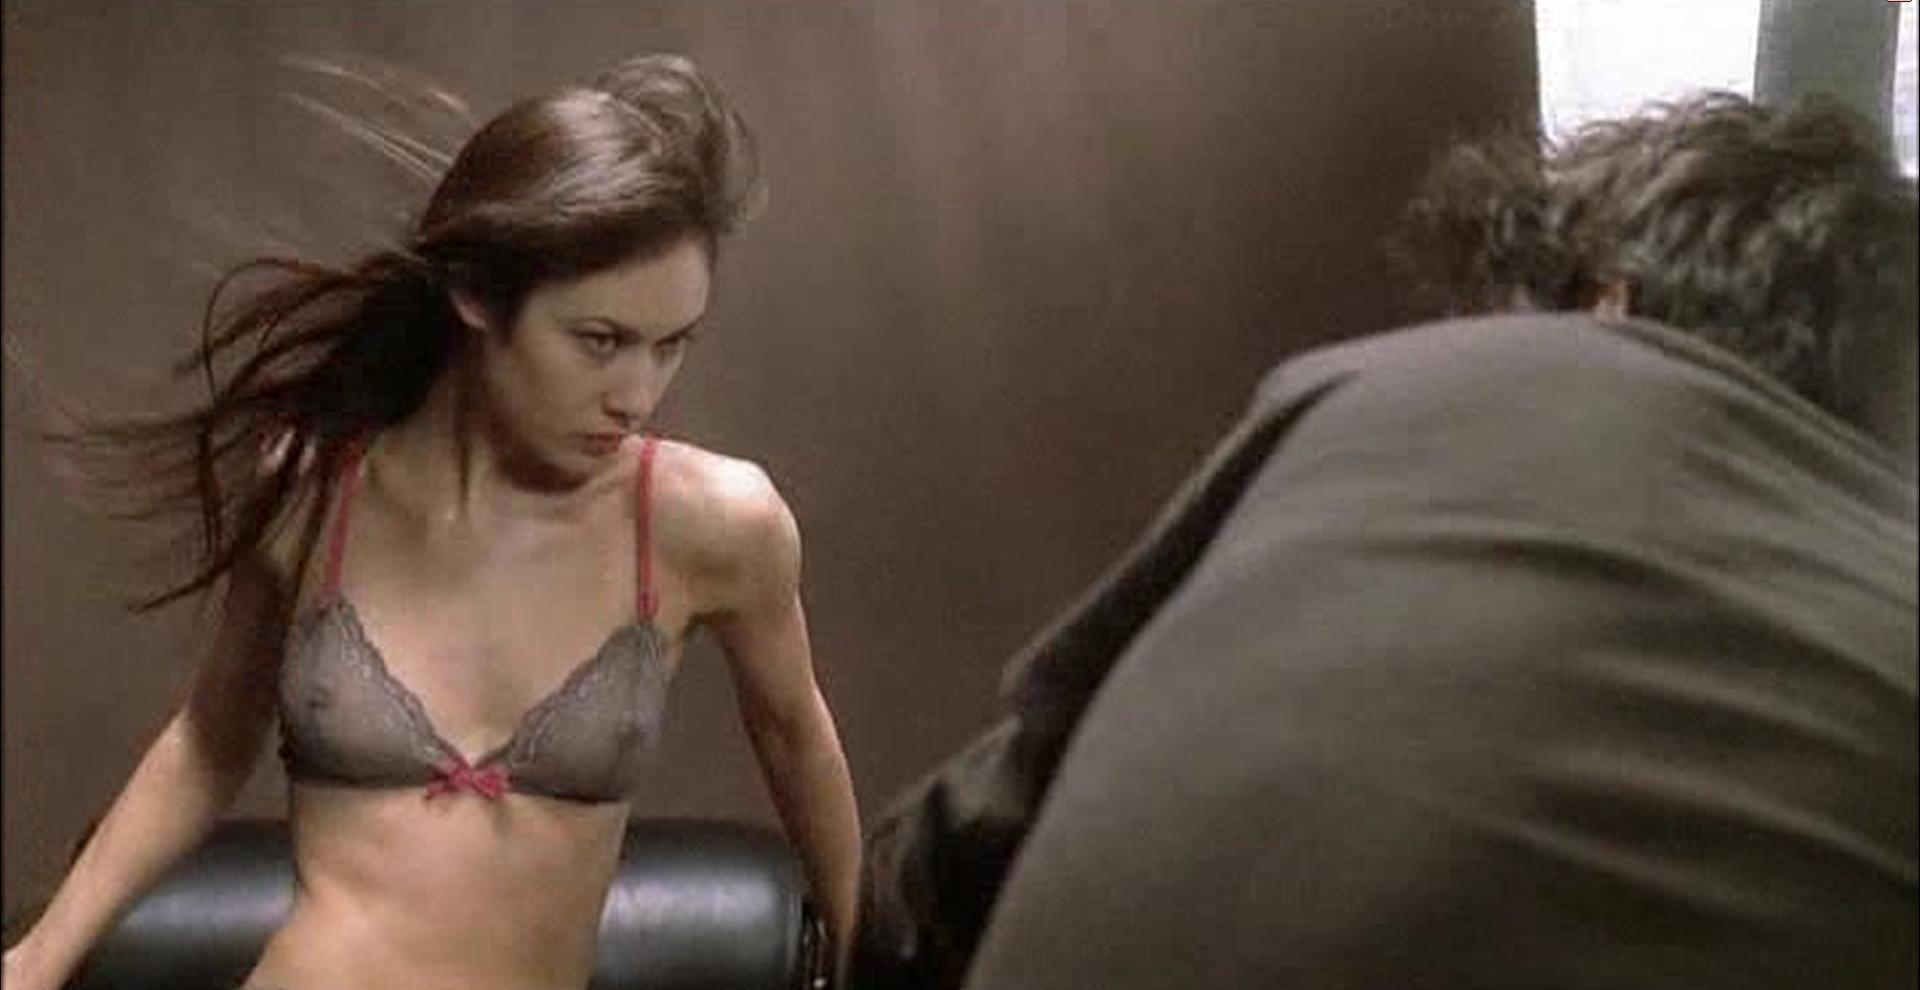 Film Celeb Porn olga kurylenko nude scene in le serpent movie - free movie